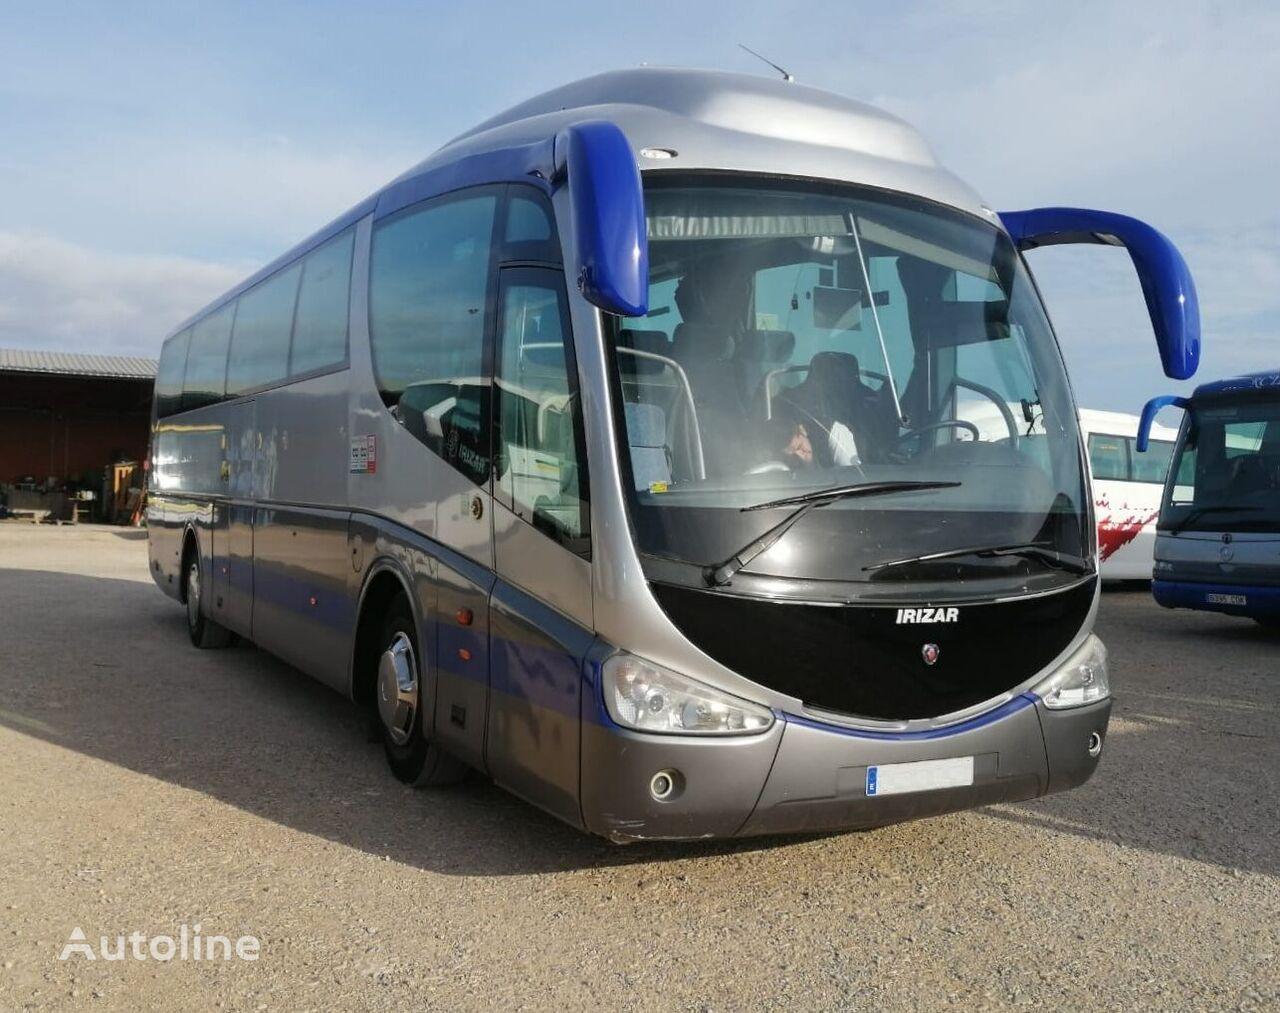 SCANIA K114 - IRIZAR PB +57 PAX EURO 3 autobús de turismo